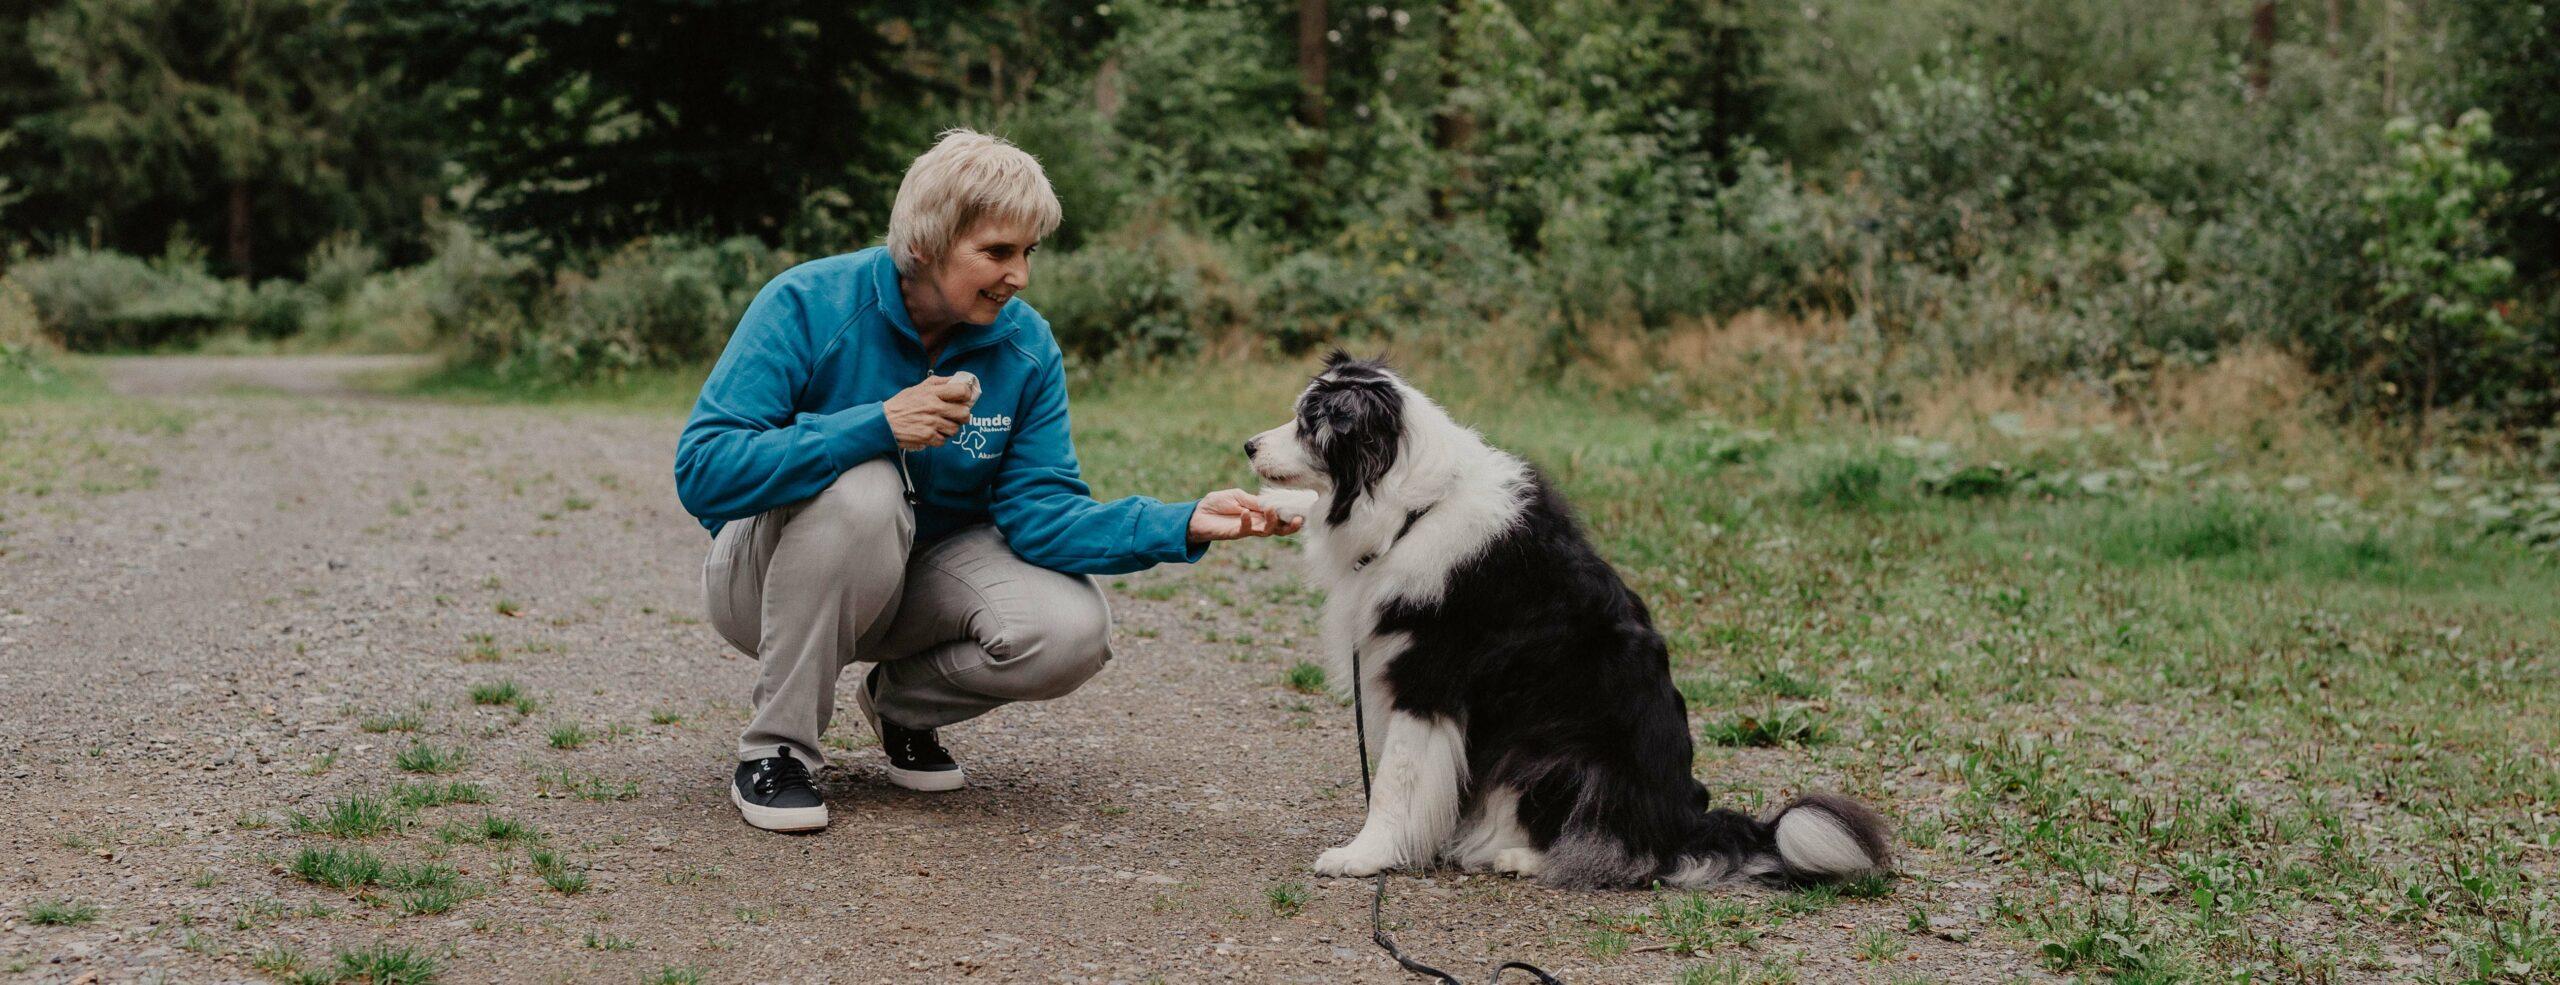 Hunde Naturell Sabine Zimmermeister